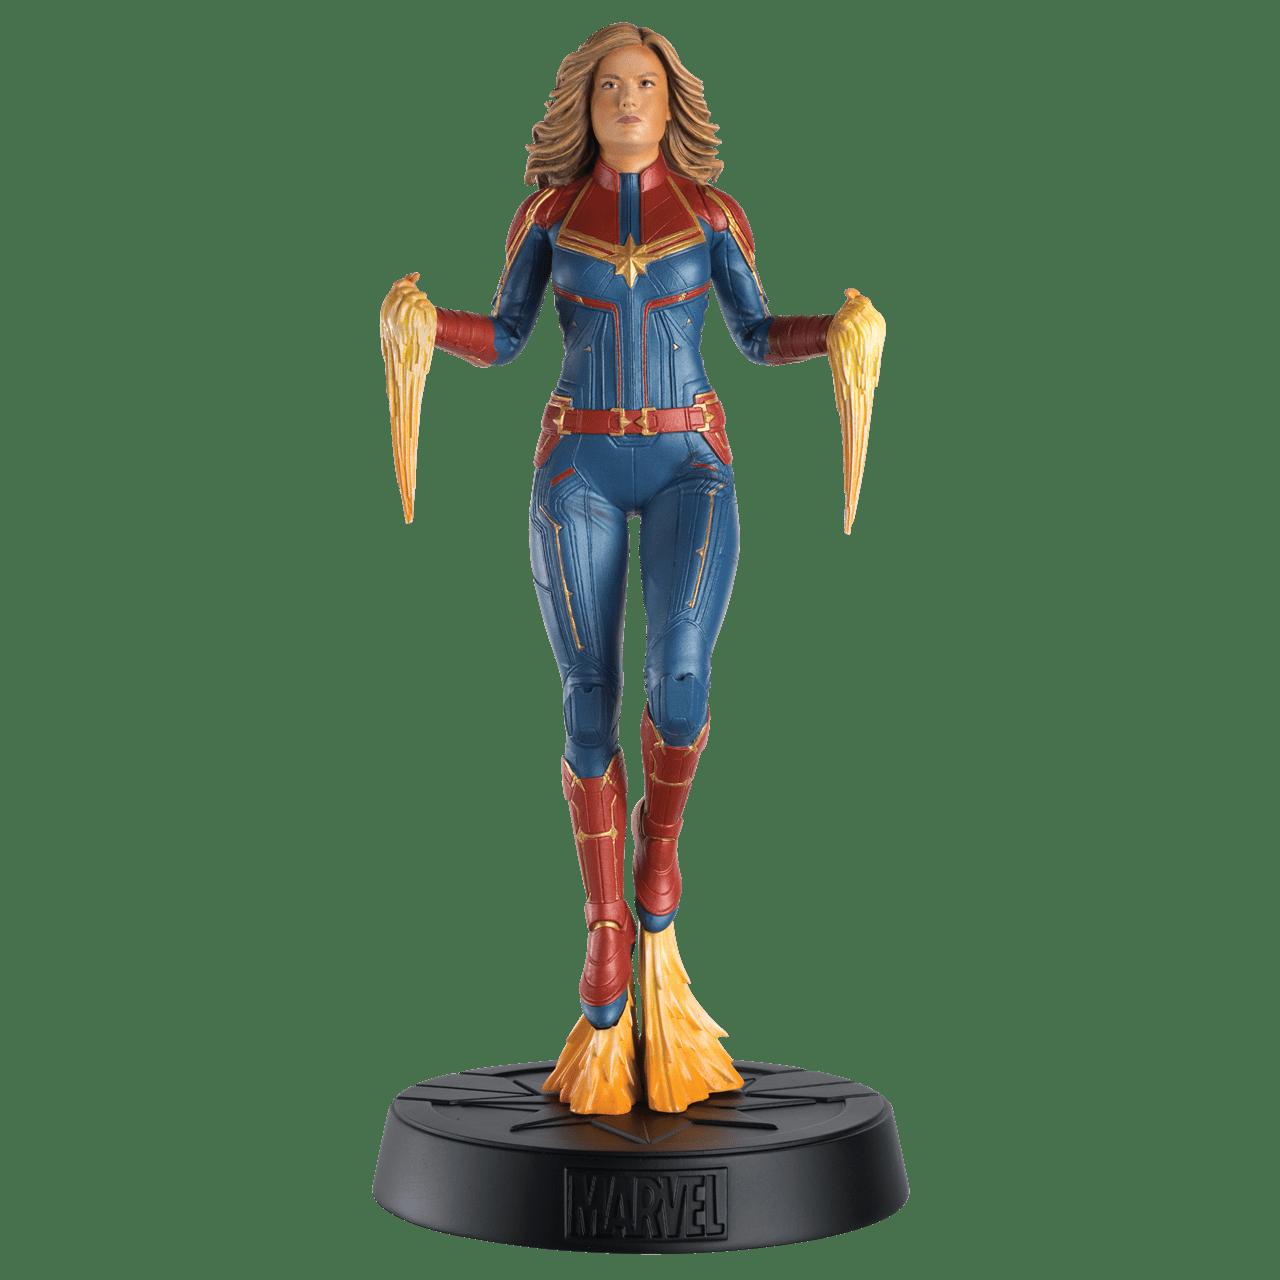 Captain Marvel: Marvel Mega Figurine (online only) Hero Collector - 2